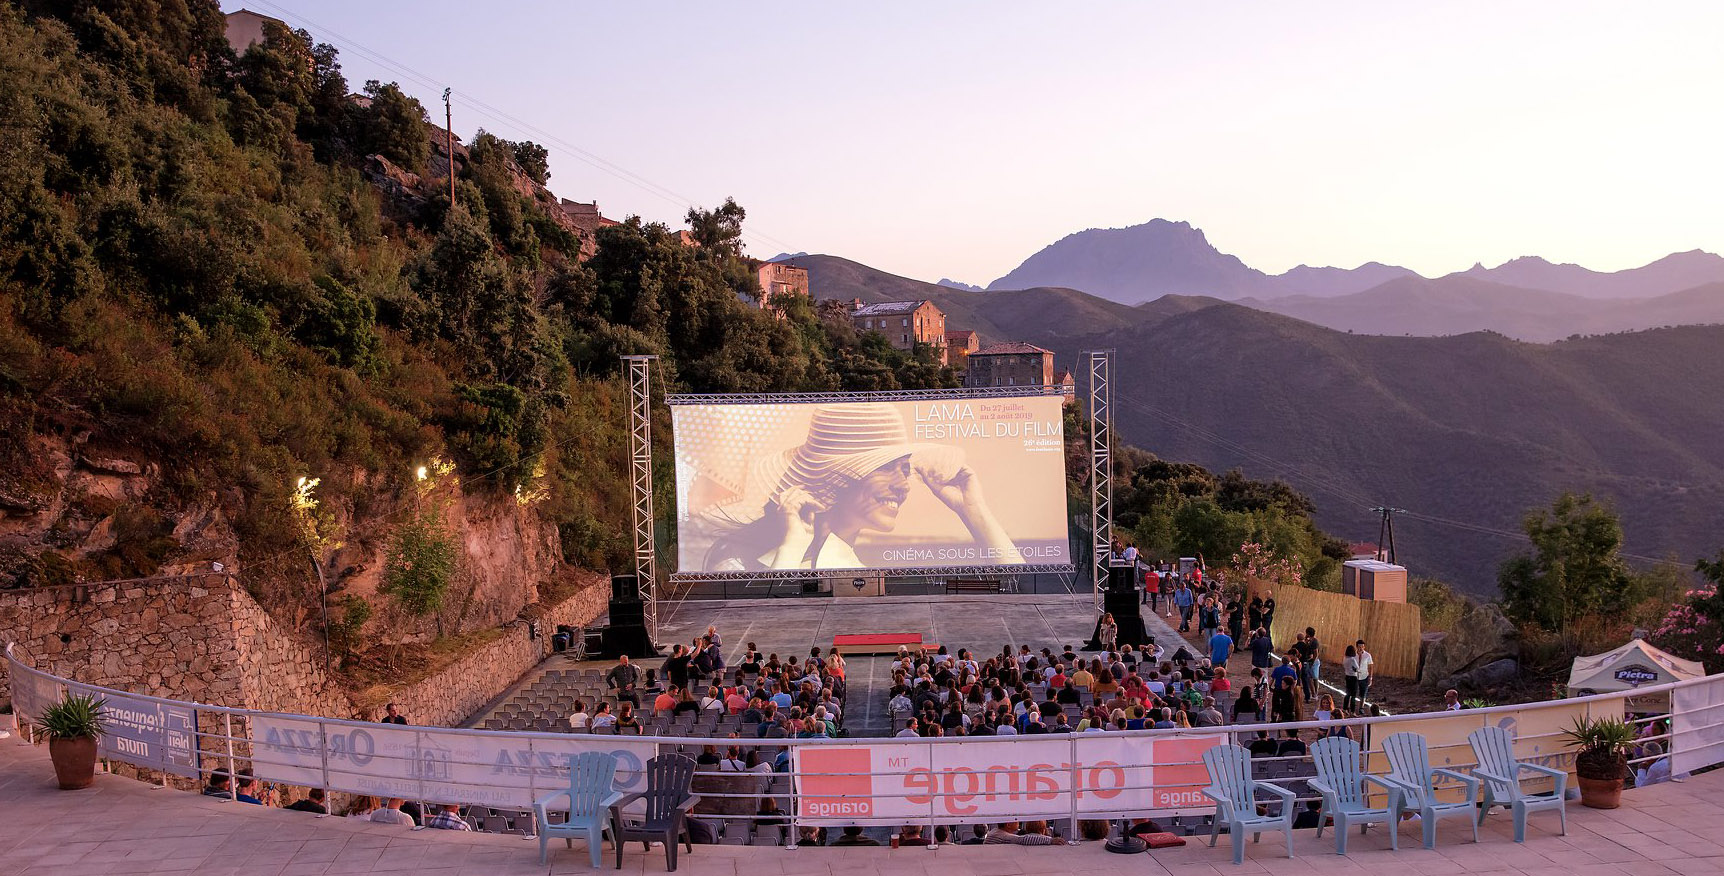 Le site de la piscine - Festival du film de Lama 2019 ©Novellart-2b